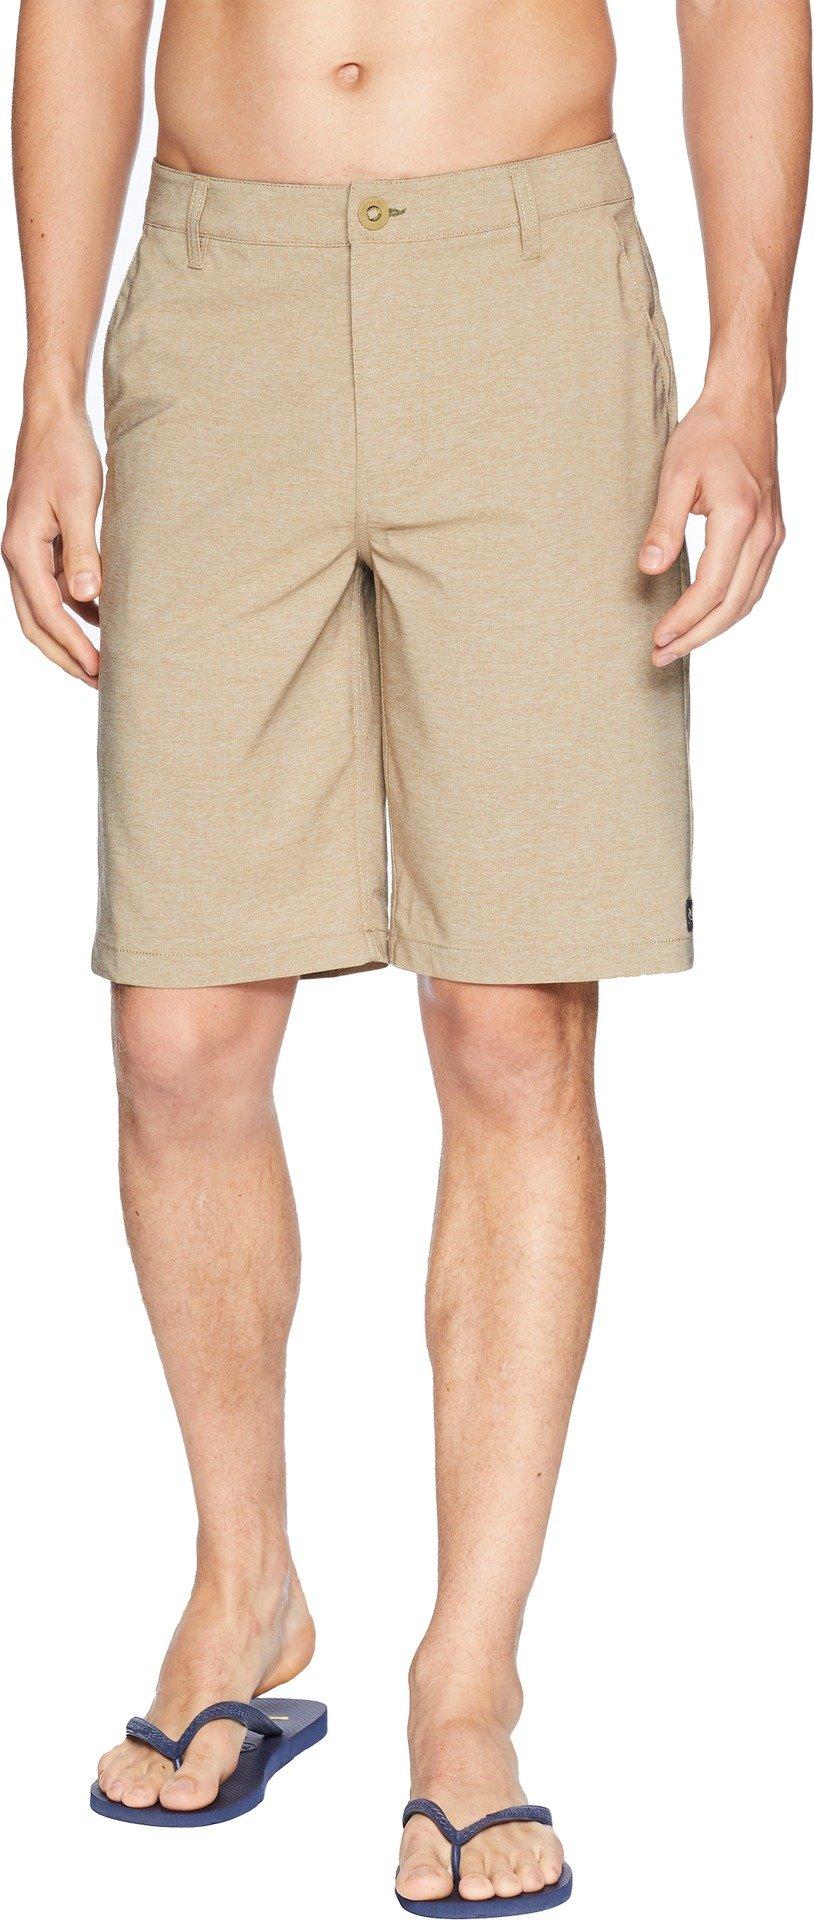 Rip Curl Men's Mirage Phase Boardwalk Walkshorts Khaki 34 11